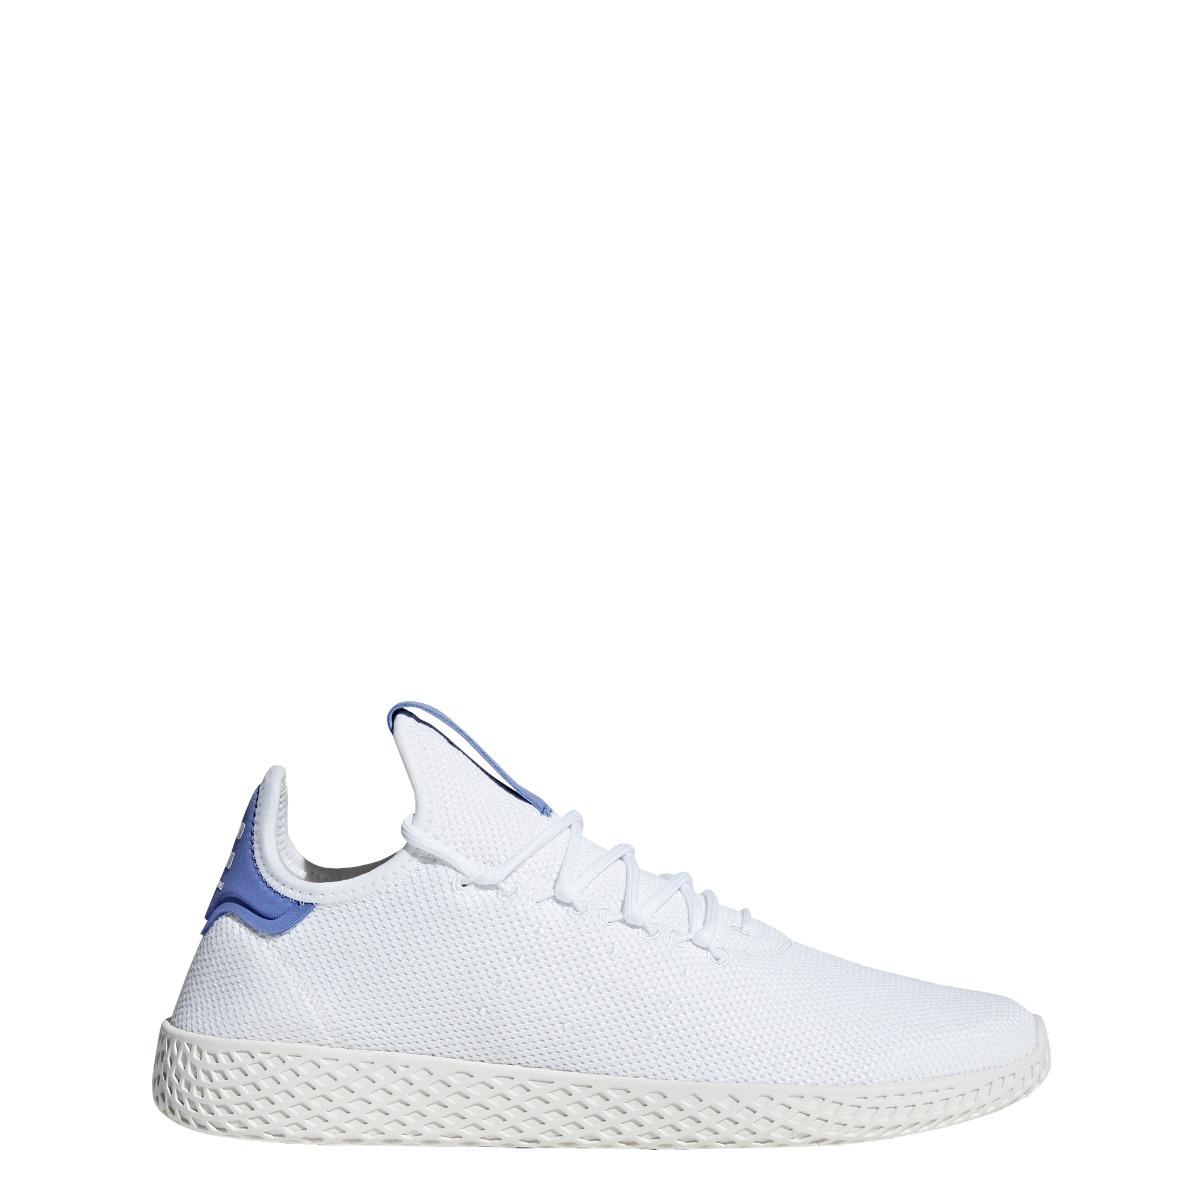 Williams Originals Adidas Pharrell Hombres Zapatillas DHE9YebW2I